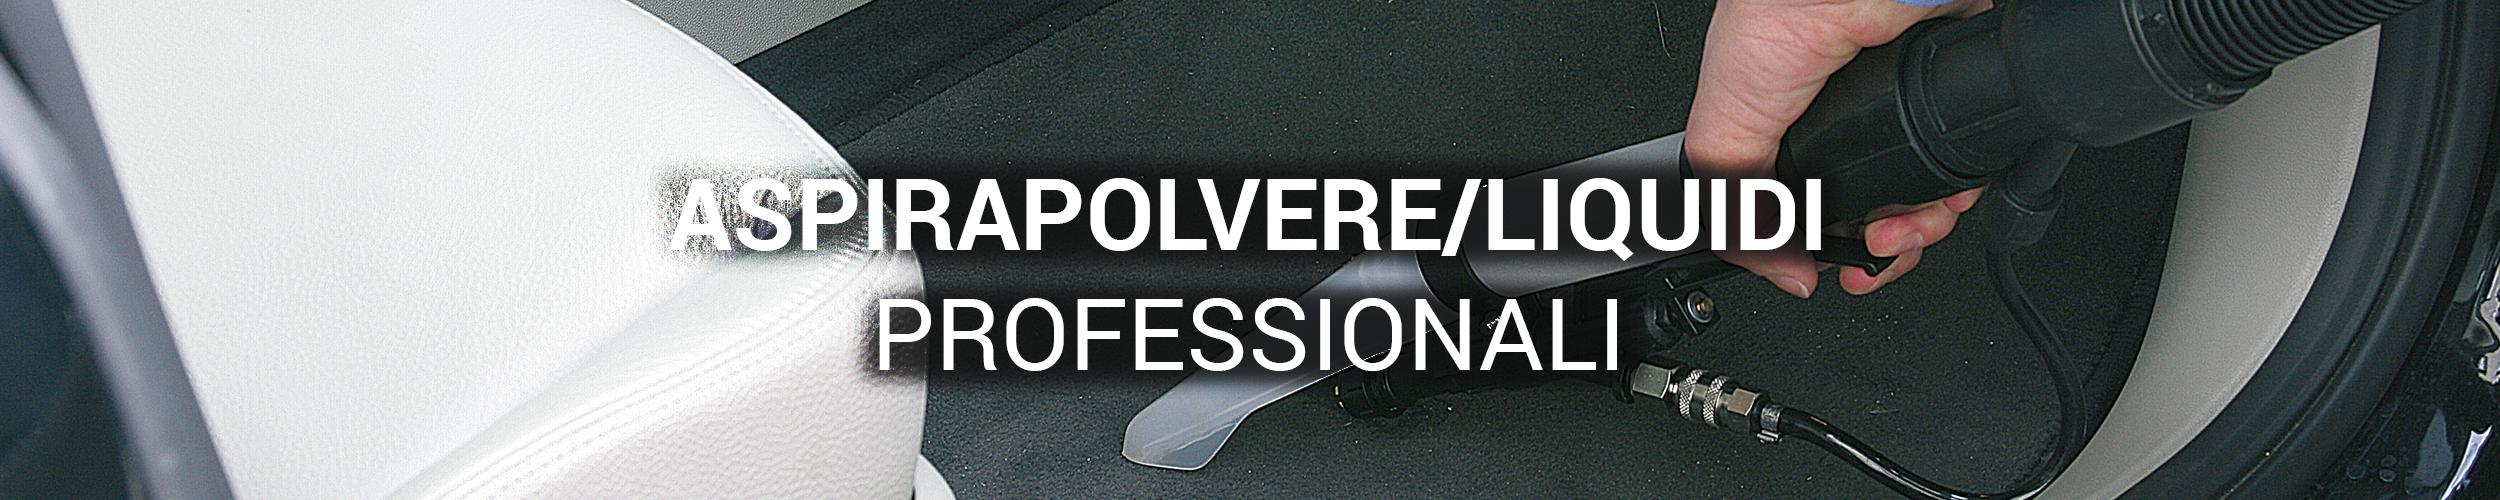 aspirapolvere+liquidi+professionali+pulizia+industriale+biemmedue.png